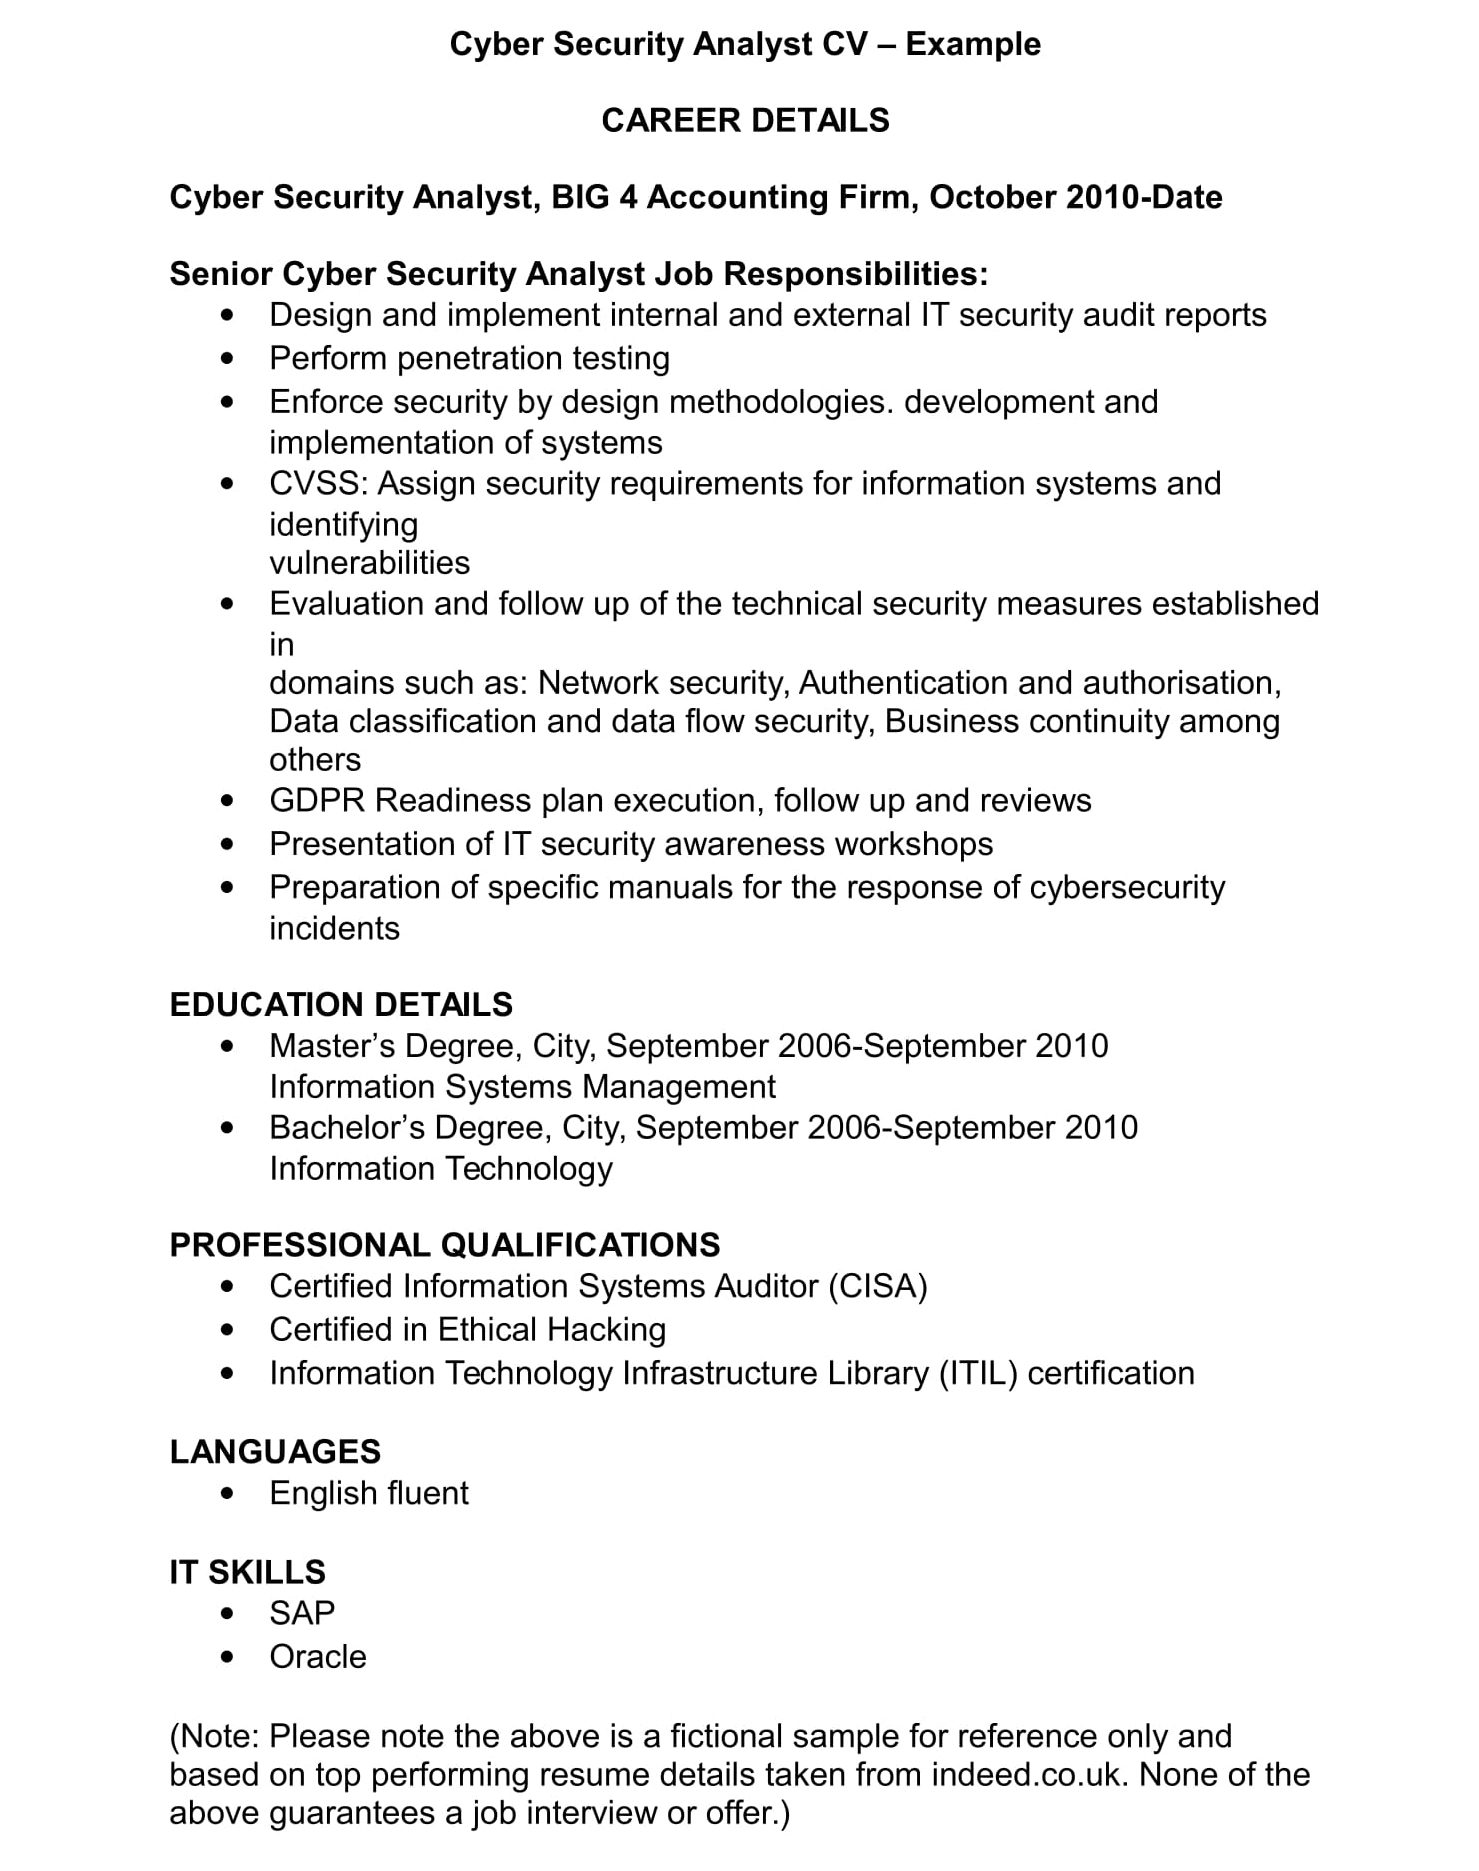 Cyber Security Cv Template And Examples Renaix Com